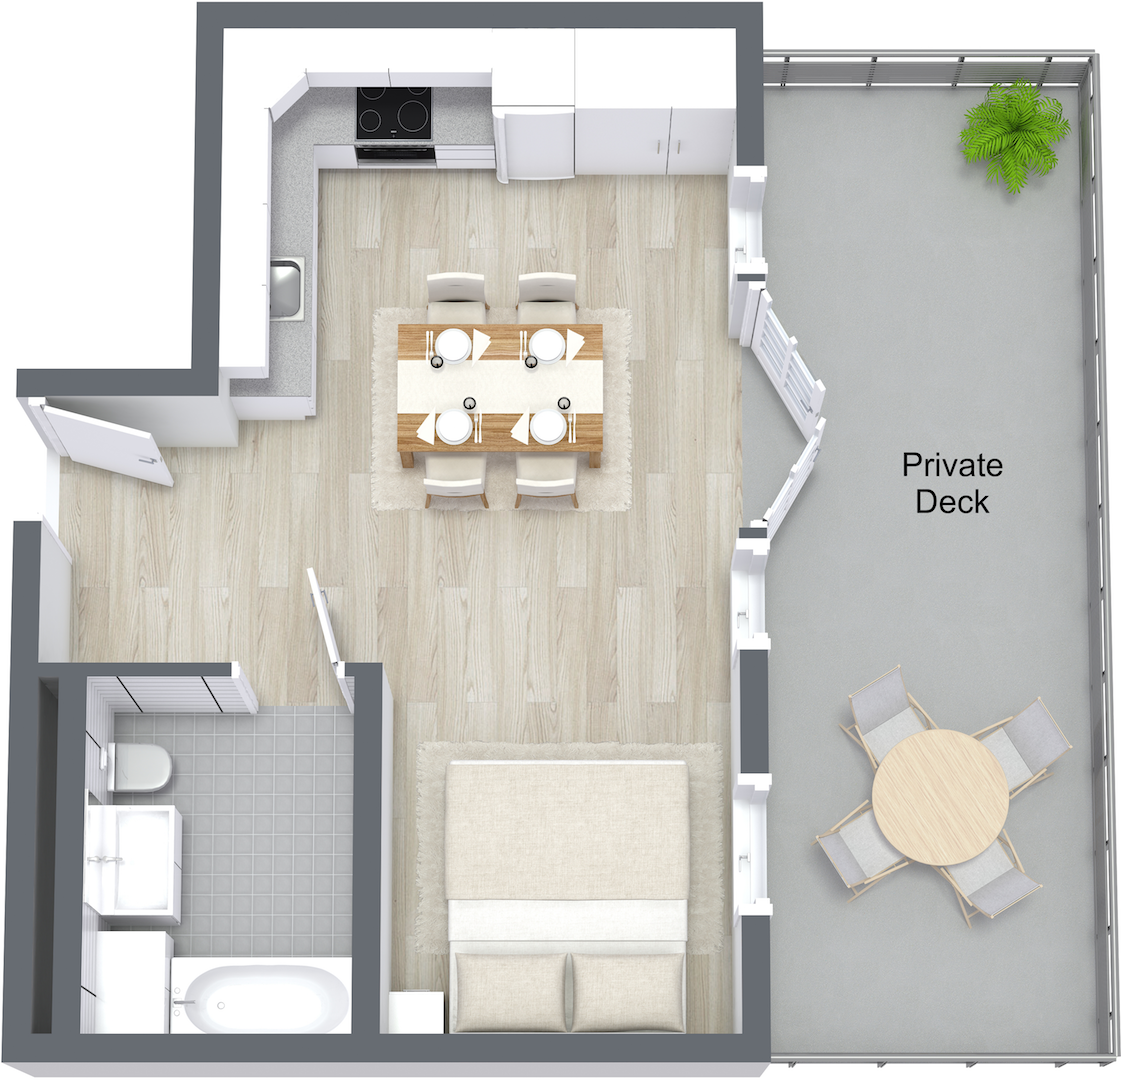 246 Ritch - Level 2 - 3D Floor Plan copy 2.png